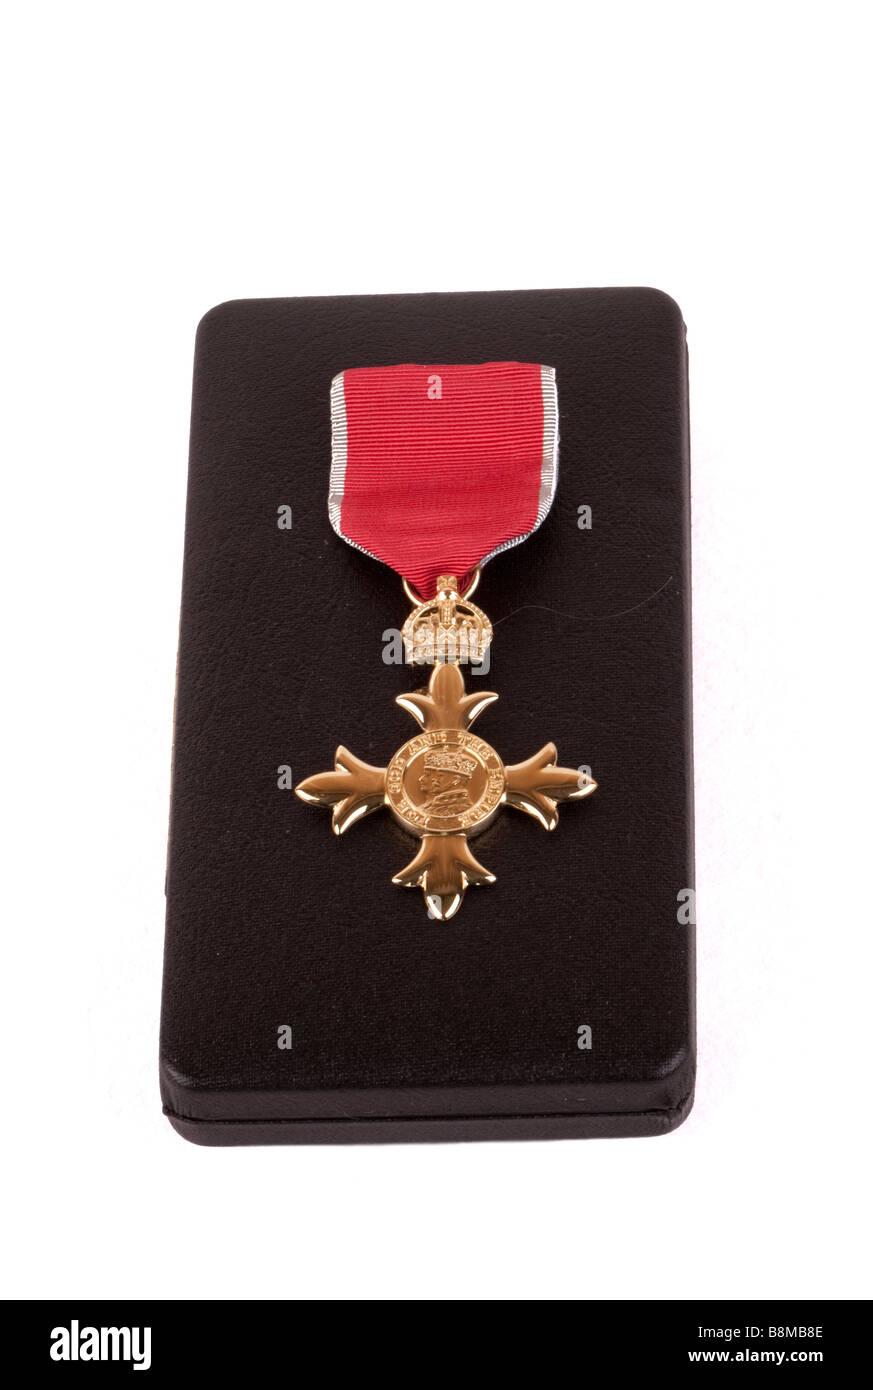 Order of the British Empire OBE Honours award emblem medal and ribbon and presentation box UK - Stock Image